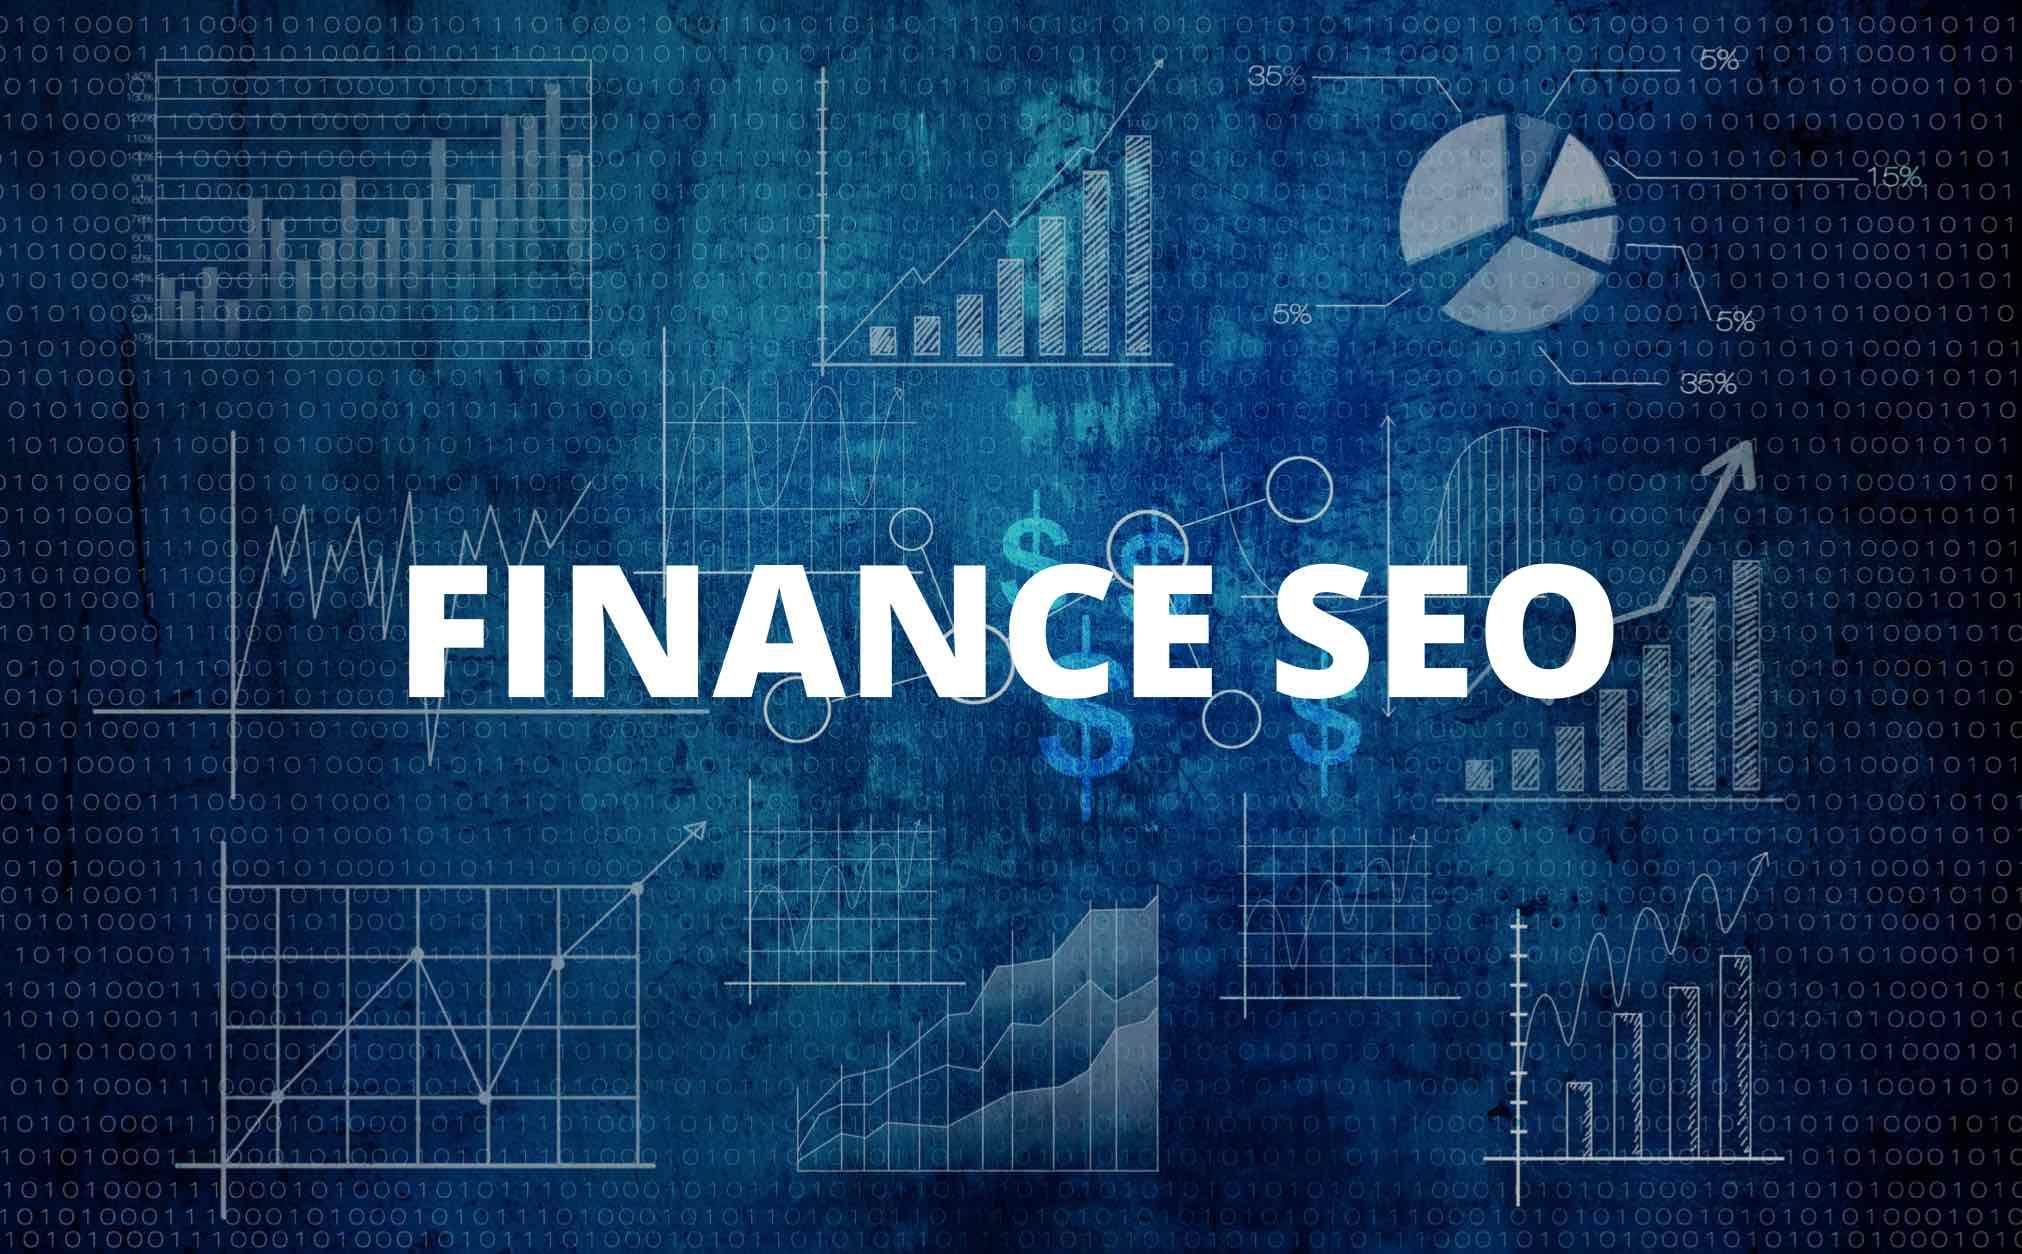 Finance SEO